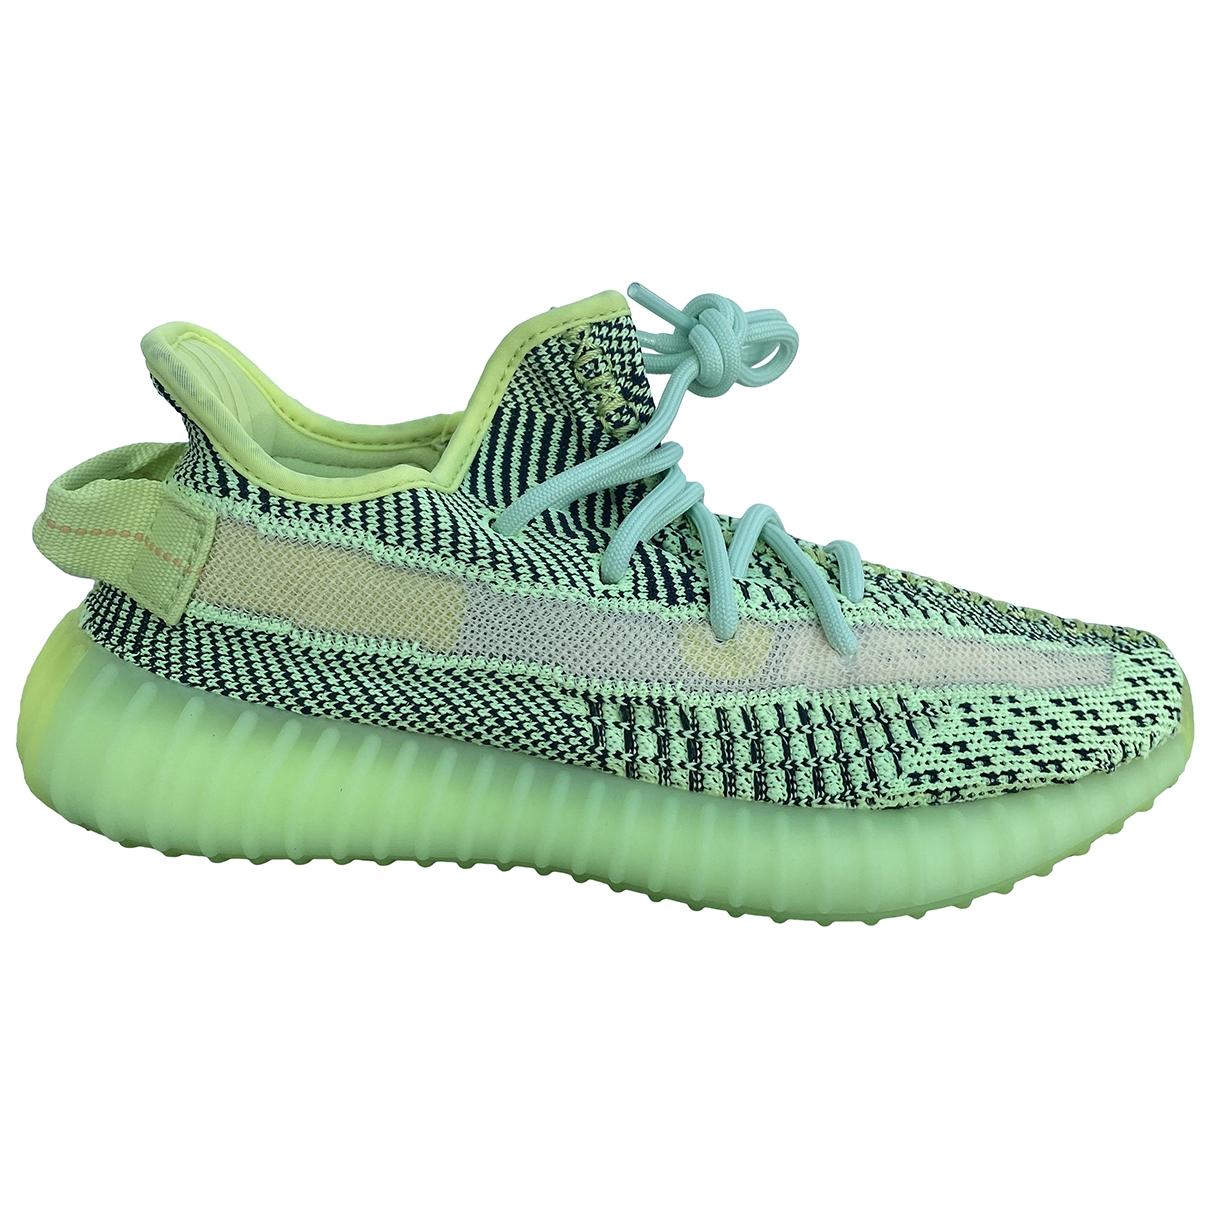 Yeezy X Adidas - Baskets Boost 350 V2 pour femme en toile - vert